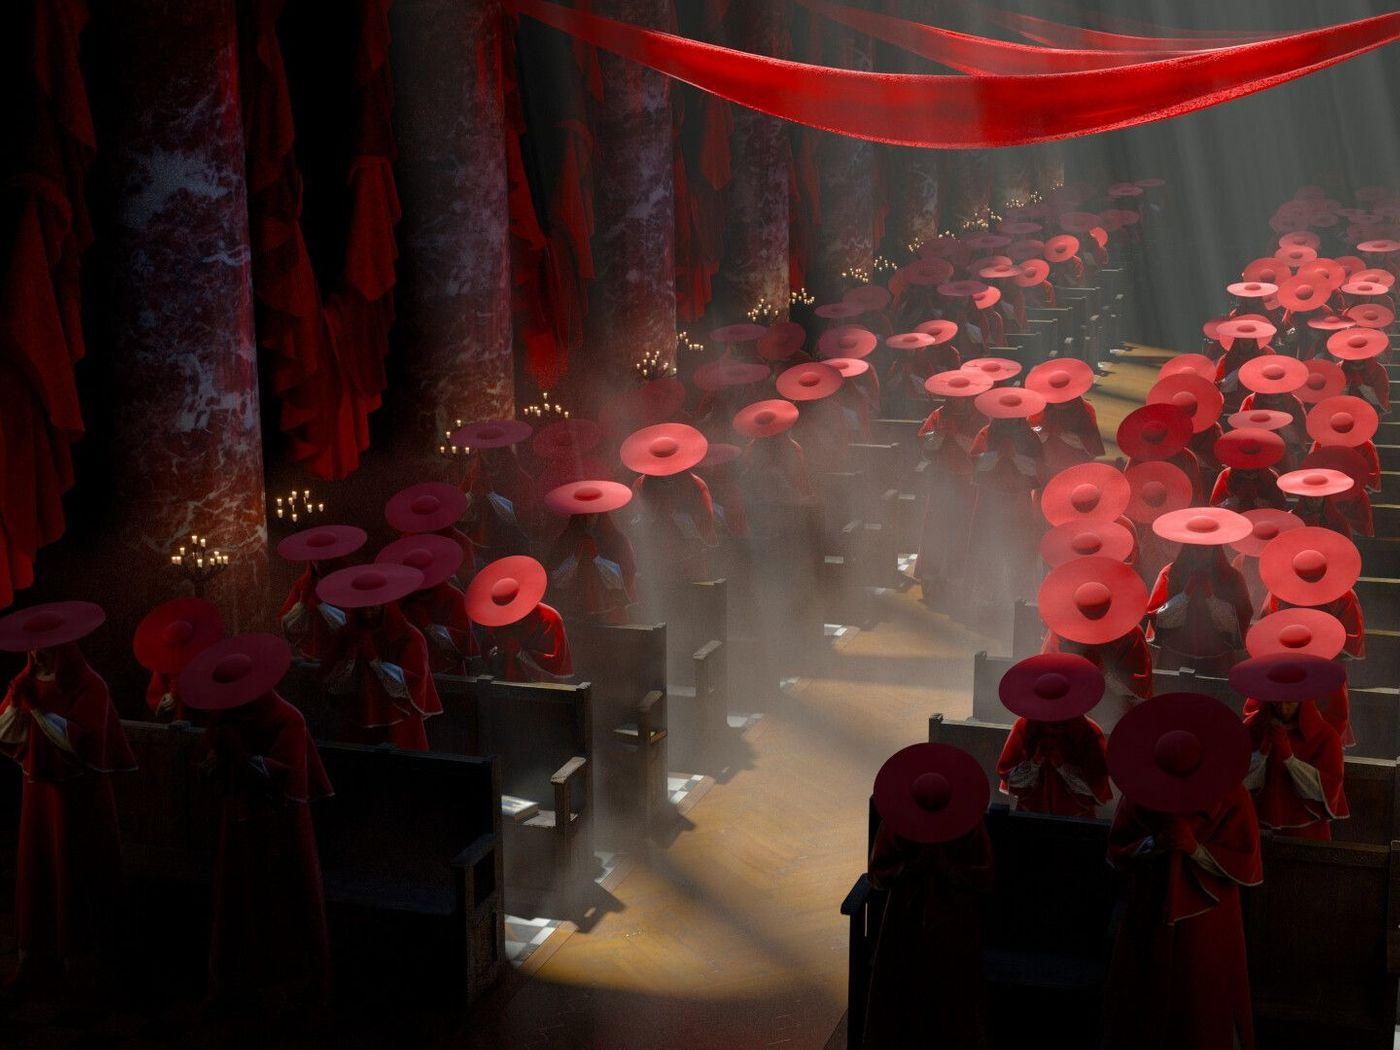 FX Demo Reel | Edmond Boulet-Gilly